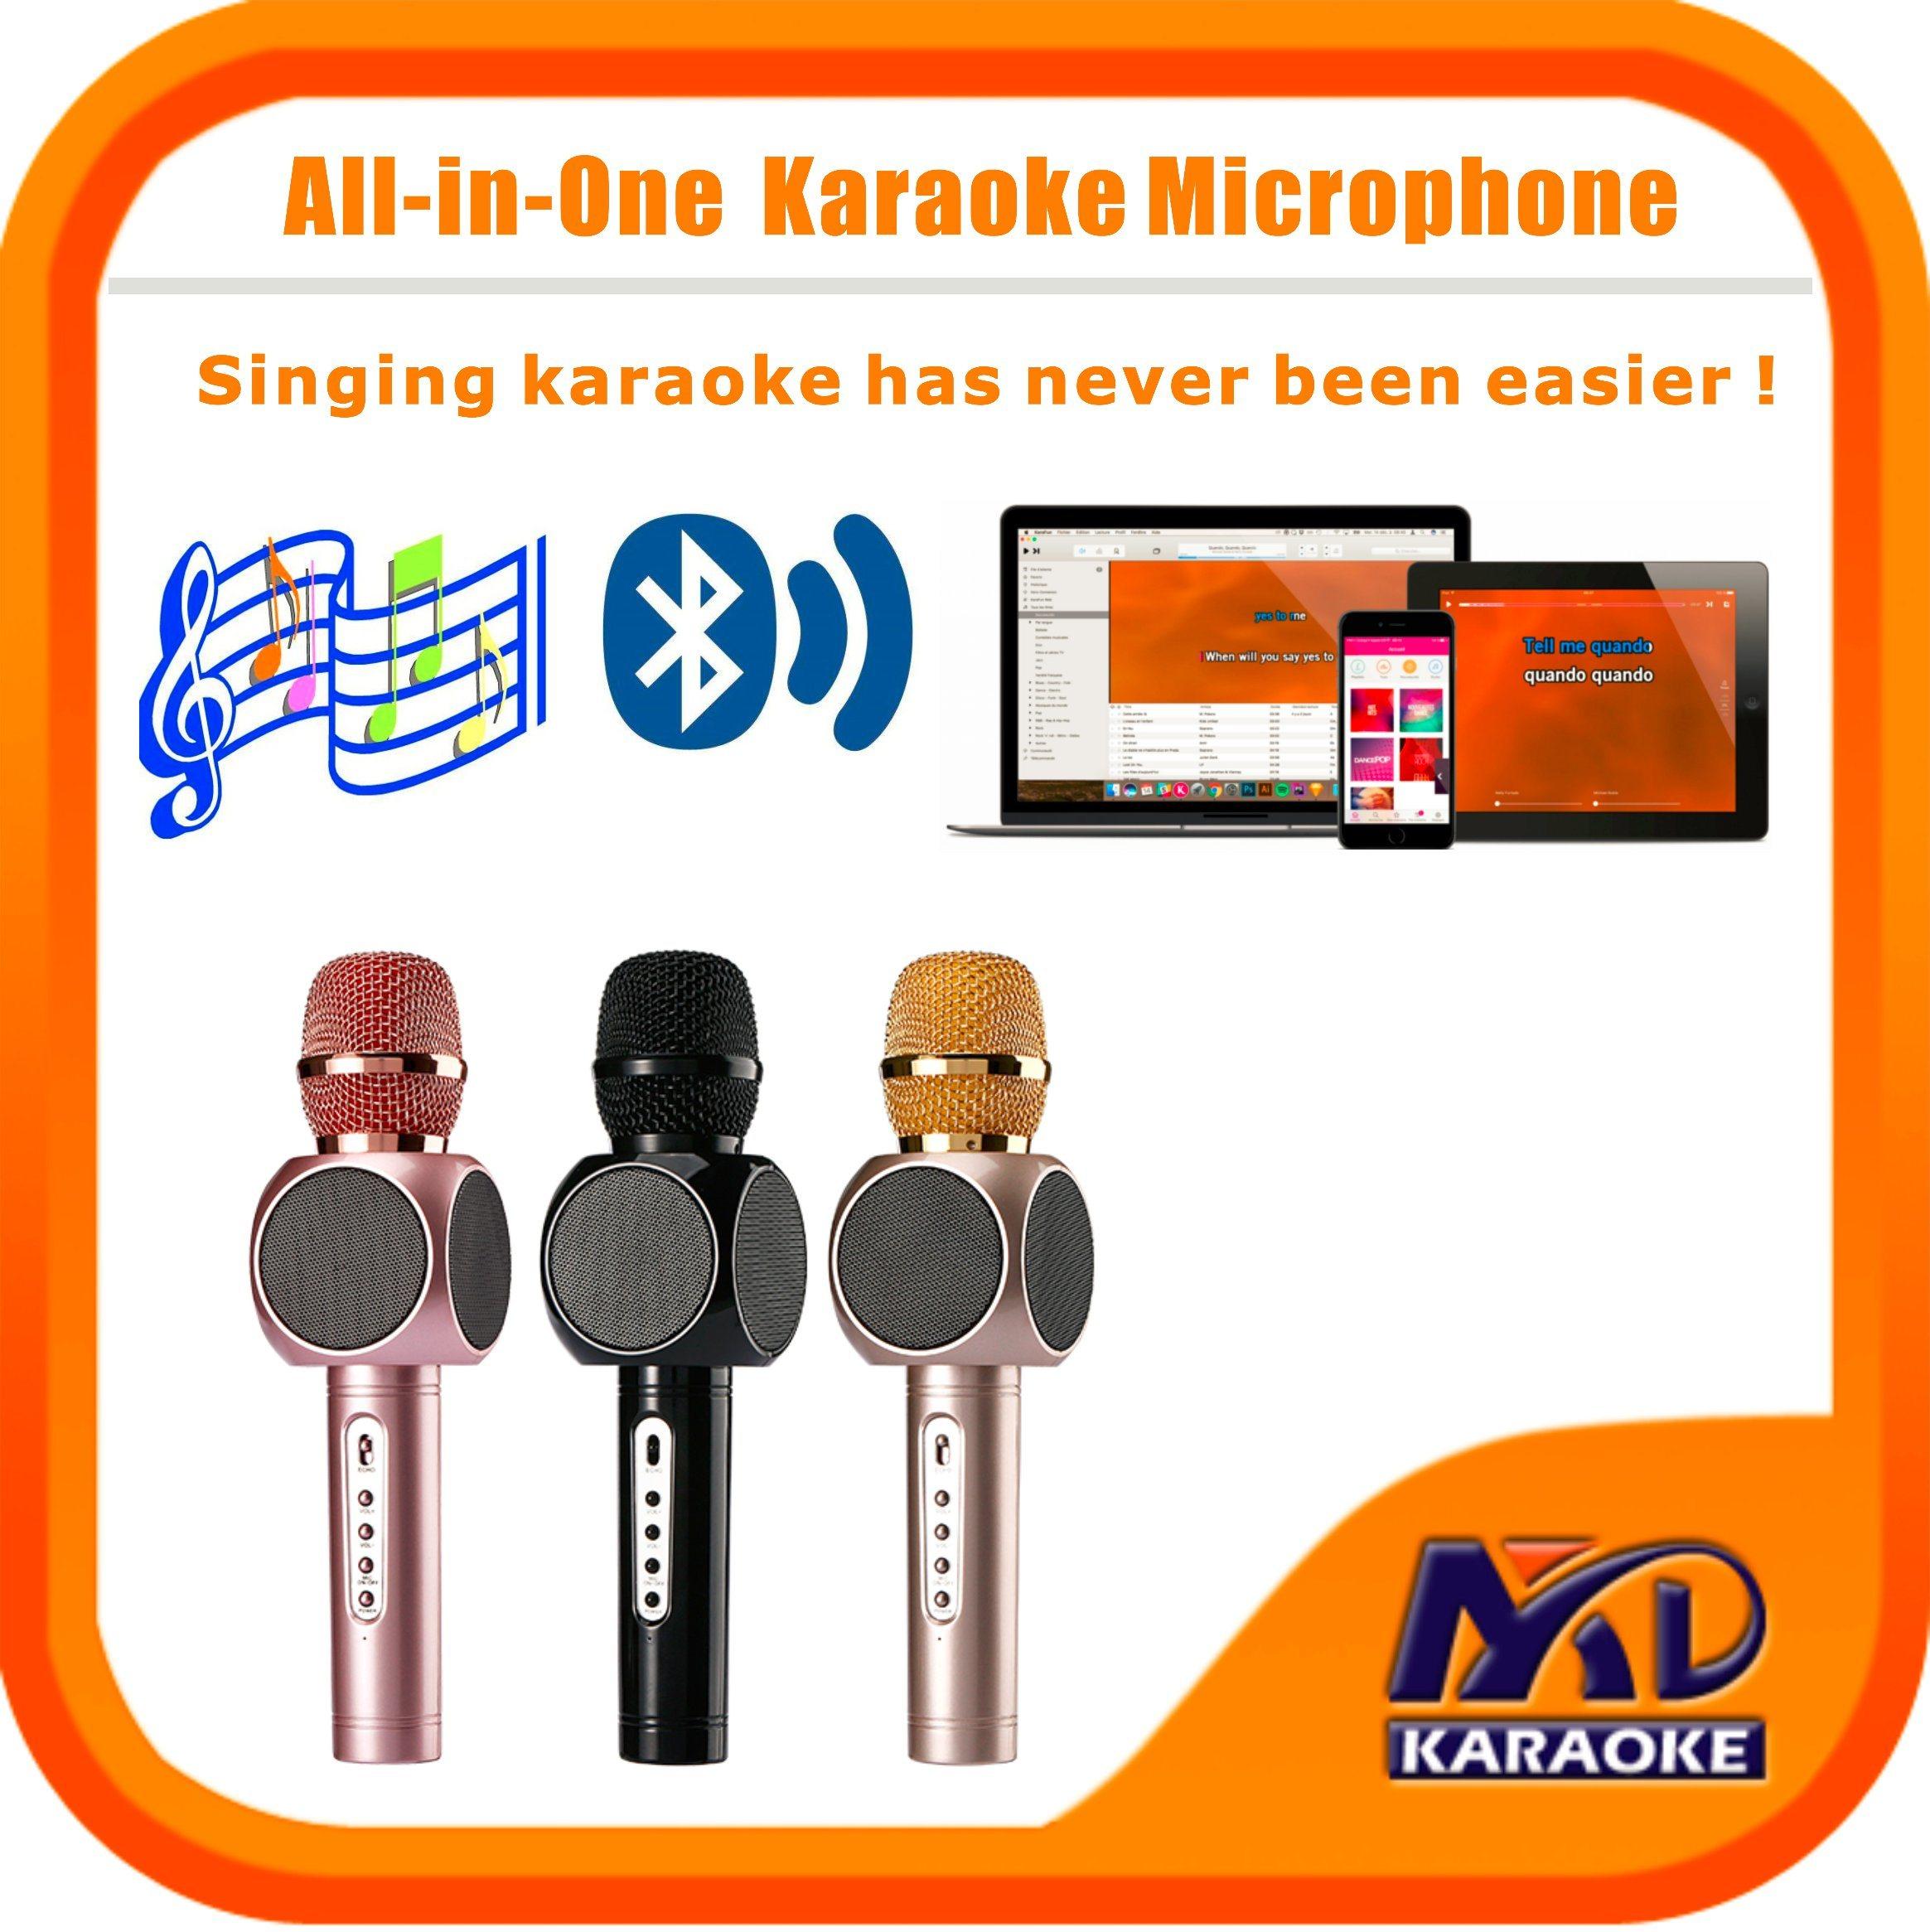 Wireless Bluetooth Microphone Multi-Function Karaoke Player Home Mini Karaoke Player KTV Singing Record for iPhone Smart Phone Tablet PC Laptop